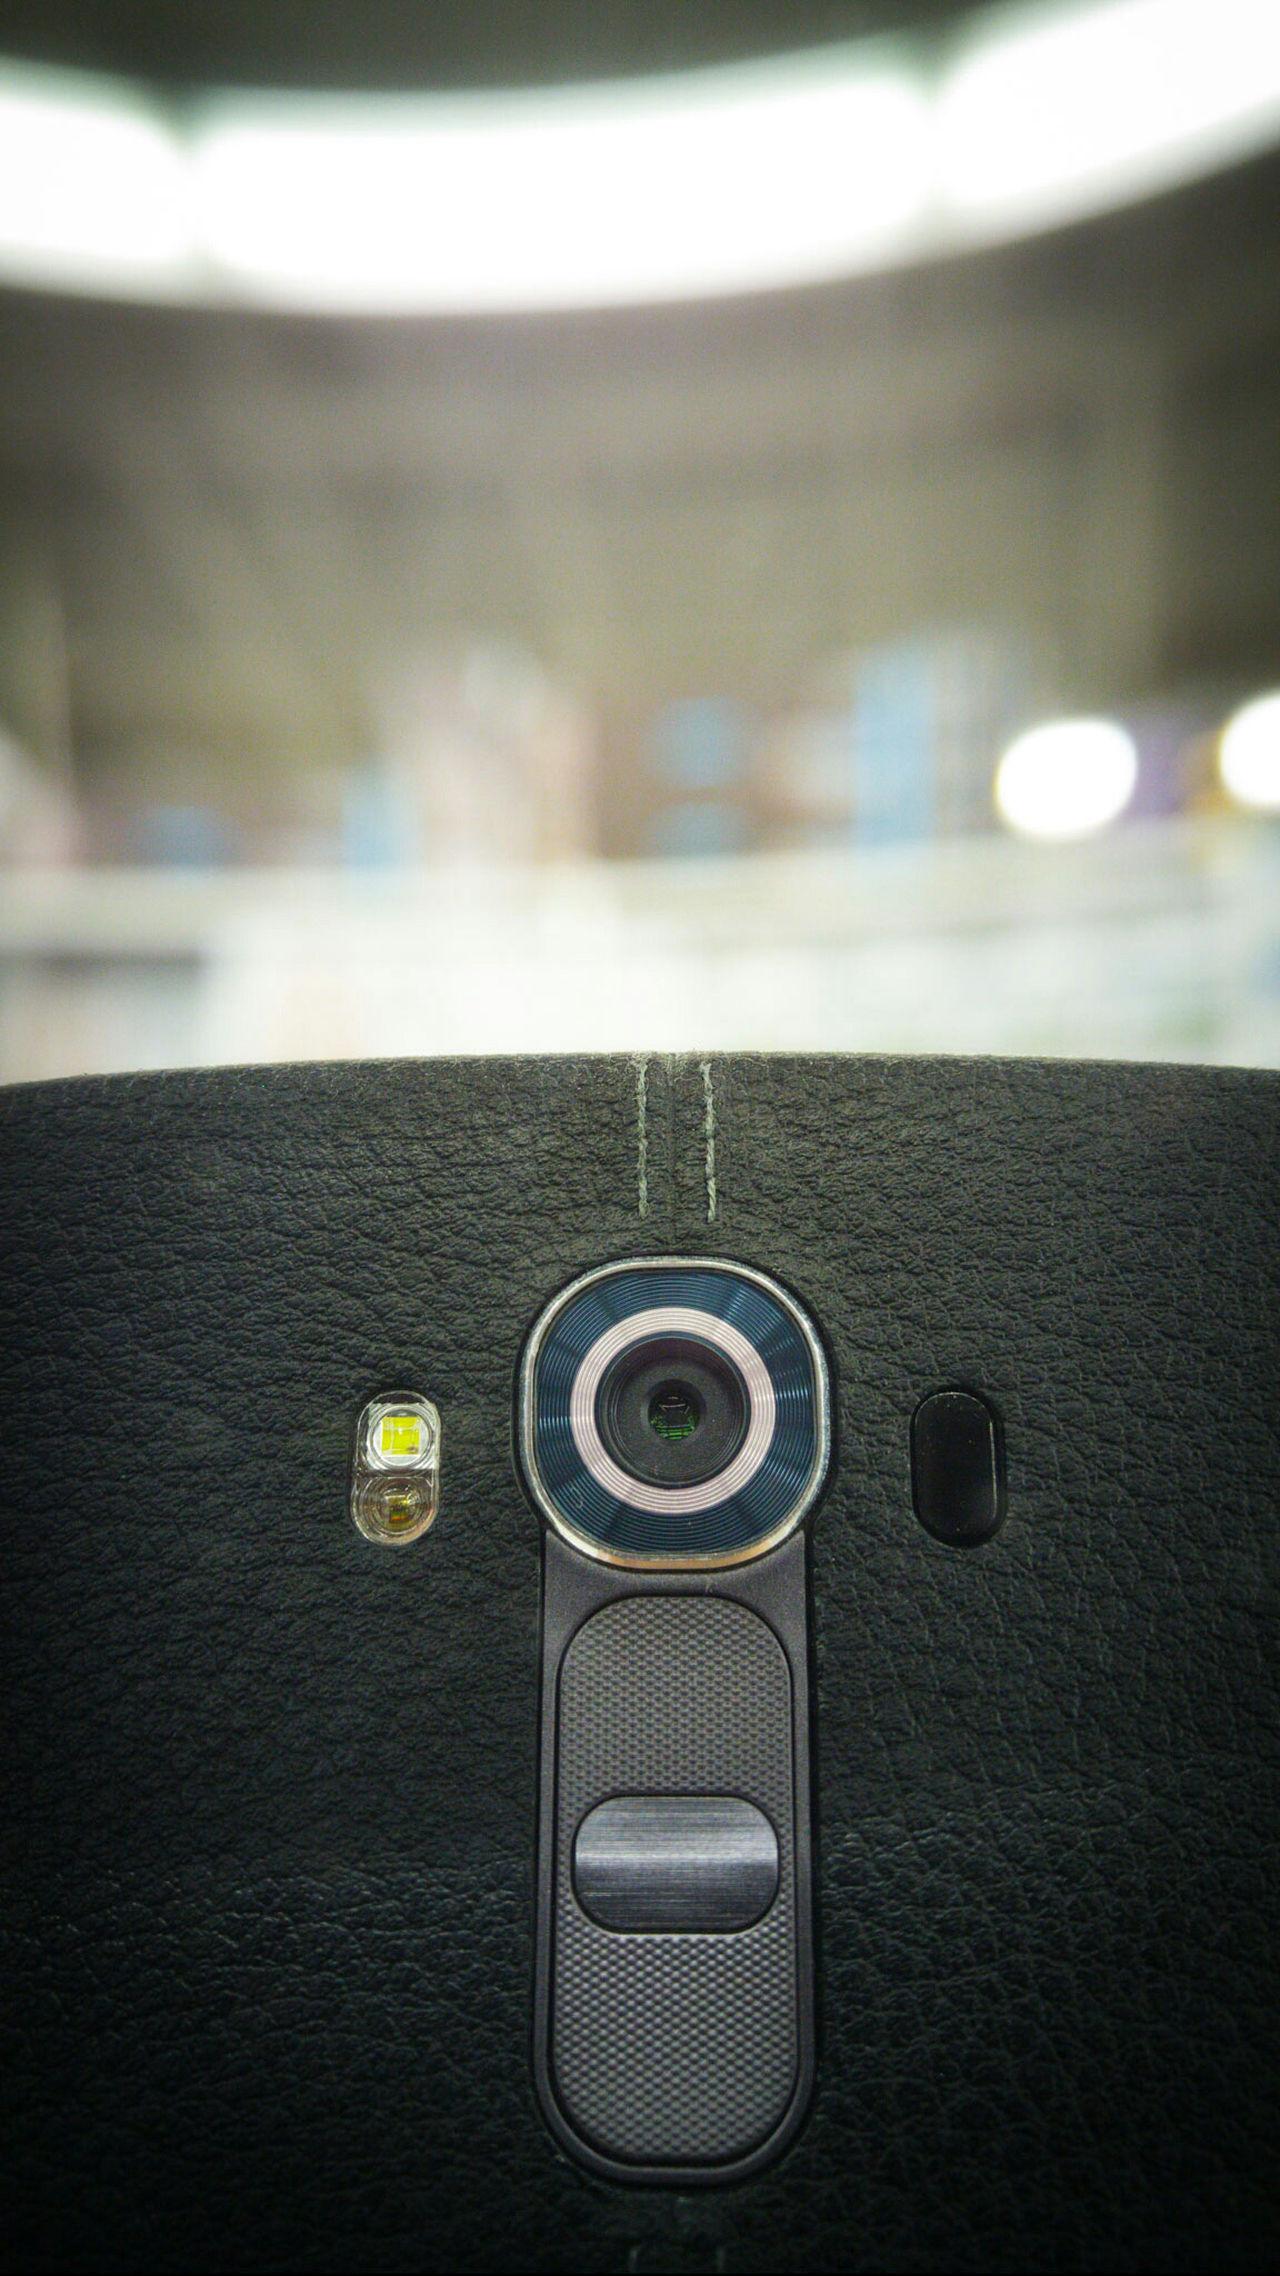 LGG4 Mobilephotography Lgmobileusa LG  Macro PhotographyCloseupshot Macro Macro_collection